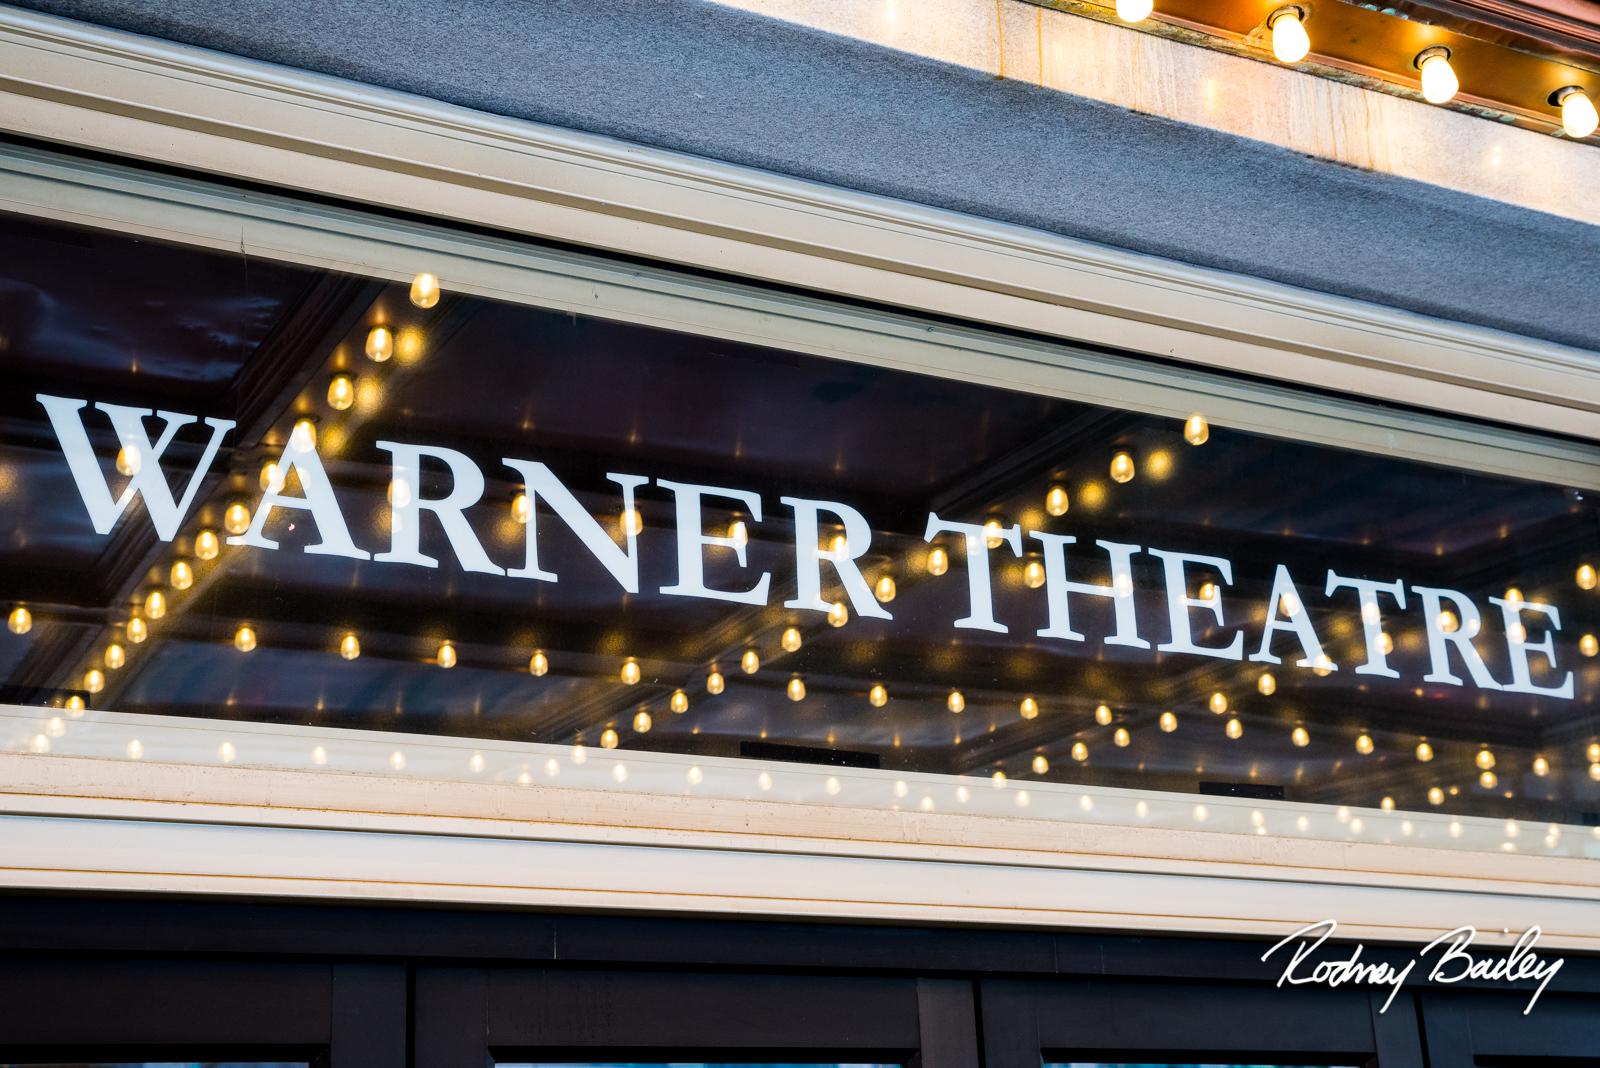 Warner Theatre Washington DC Rodney Bailey event photography event photographers